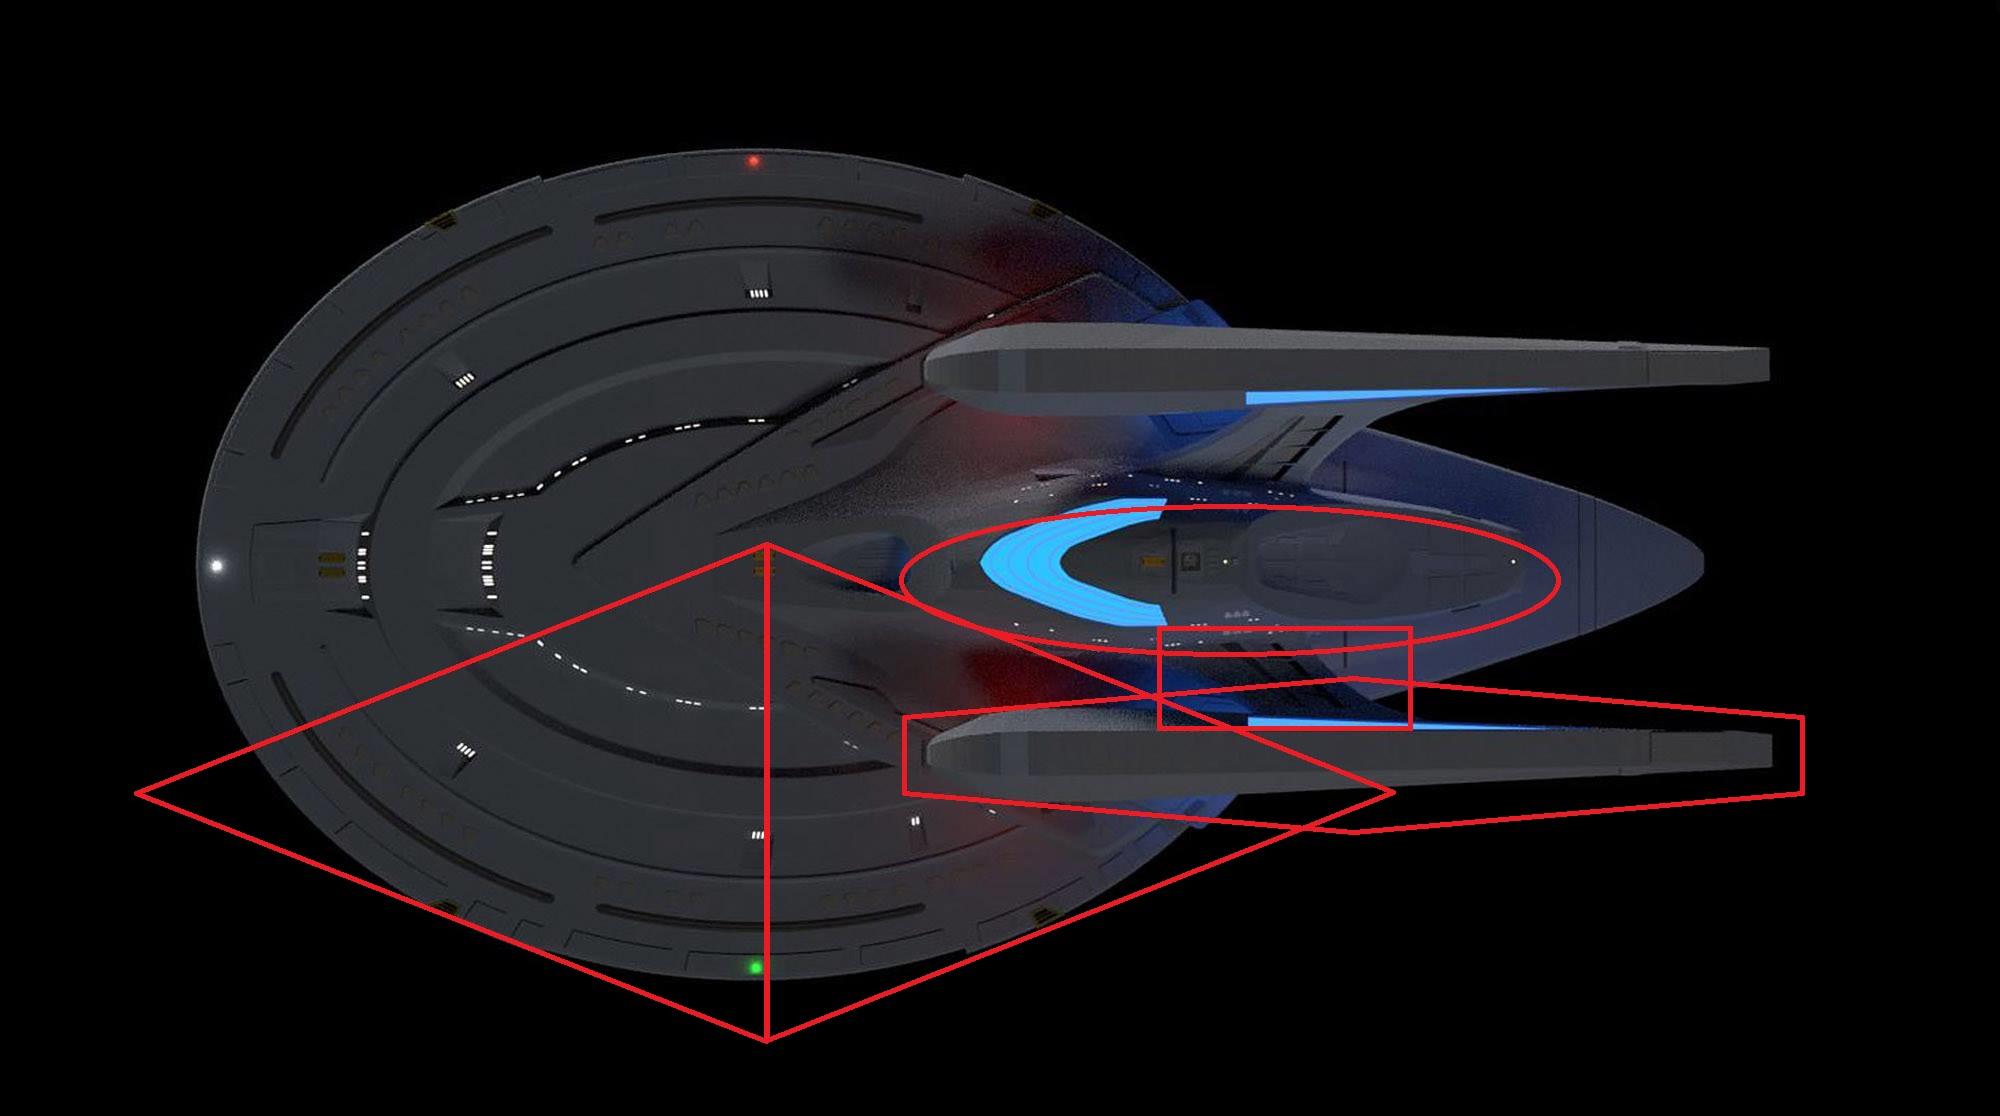 Primary_Ship_Damage_Ventral_View.jpg